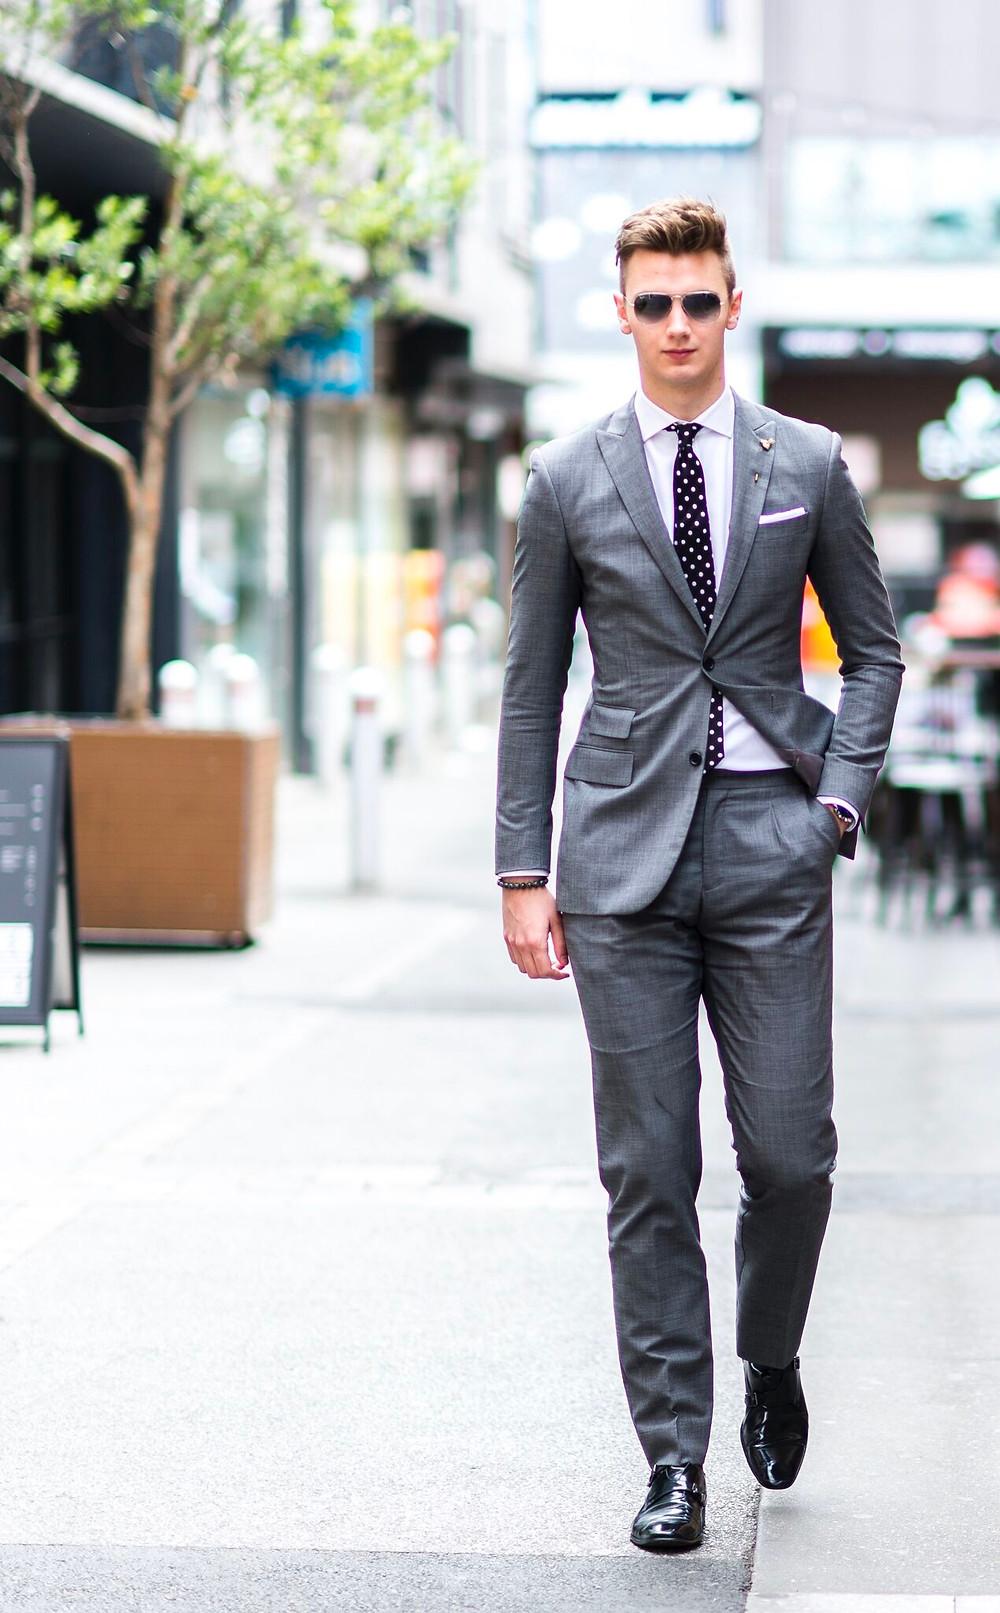 Image: Adelaide Street Stalker